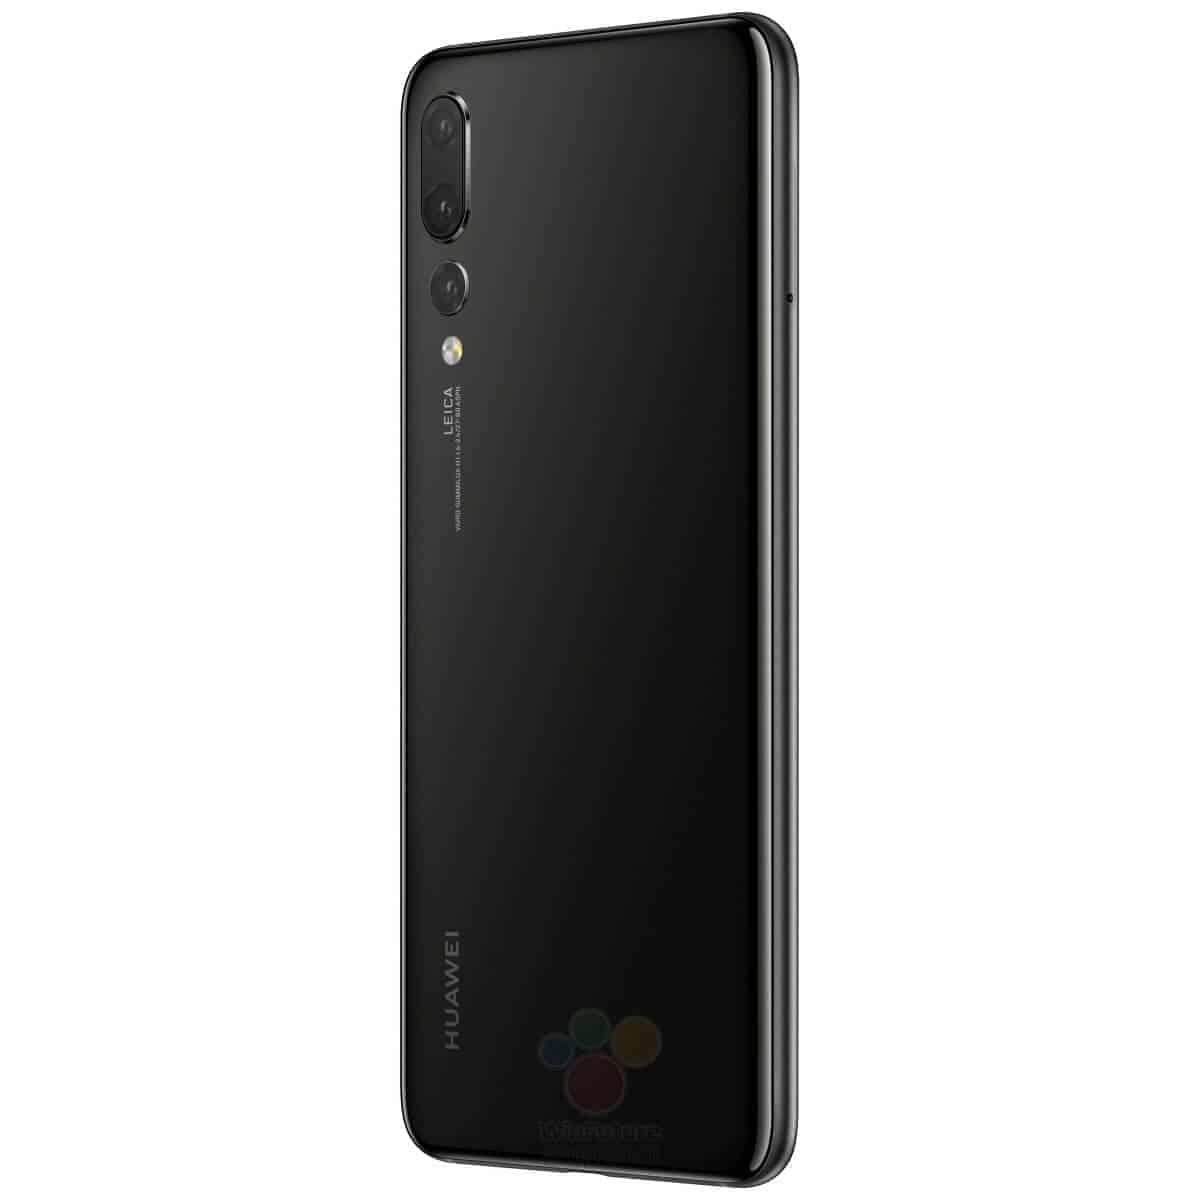 Huawei P20 Pro Press Renders 7